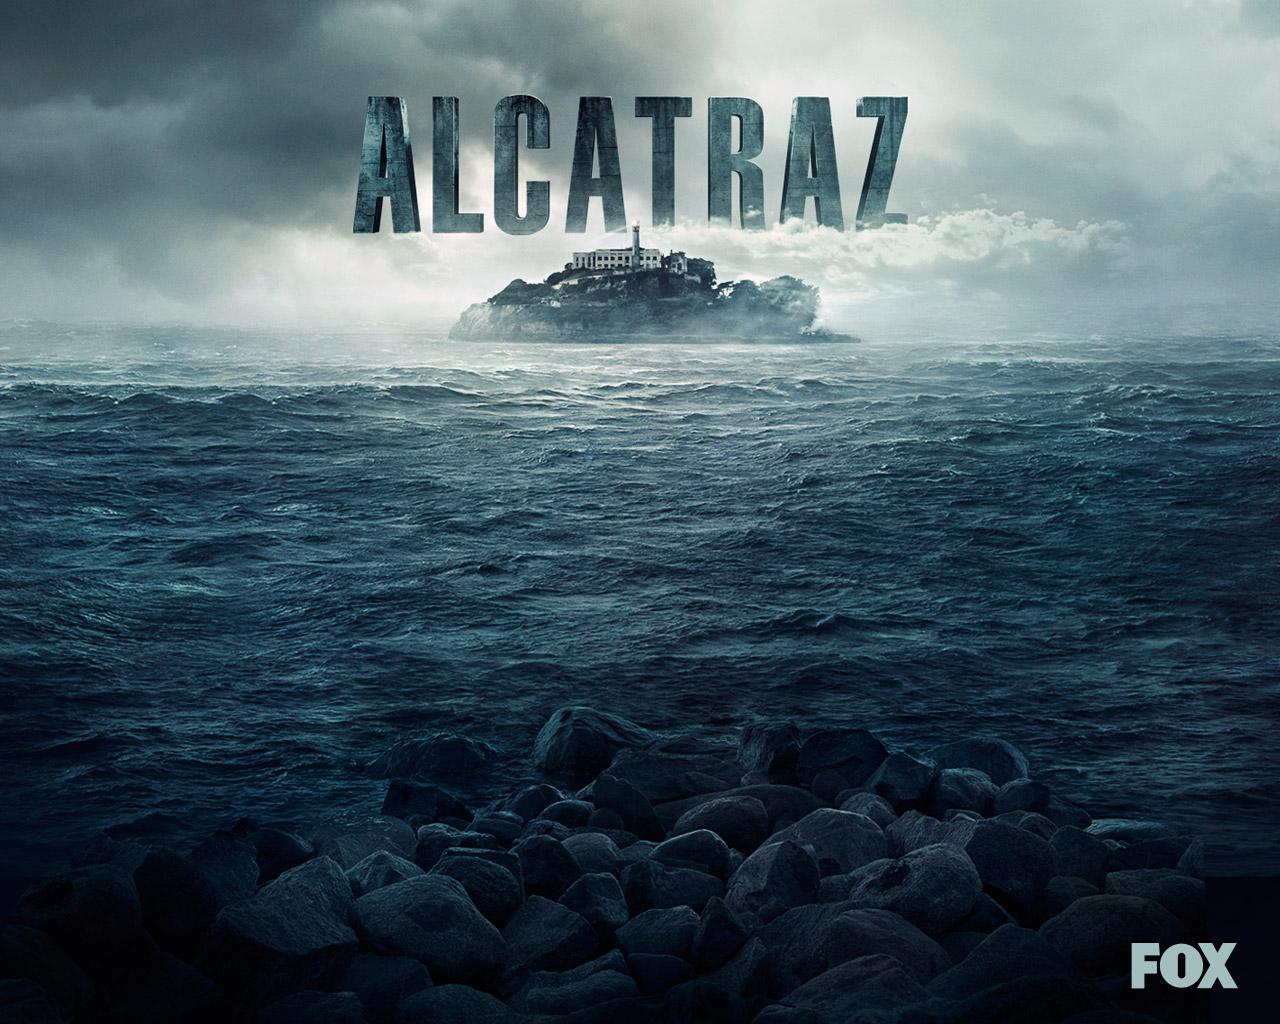 investigation discovery com investigation history alcatraz wallpaper 1280x1024